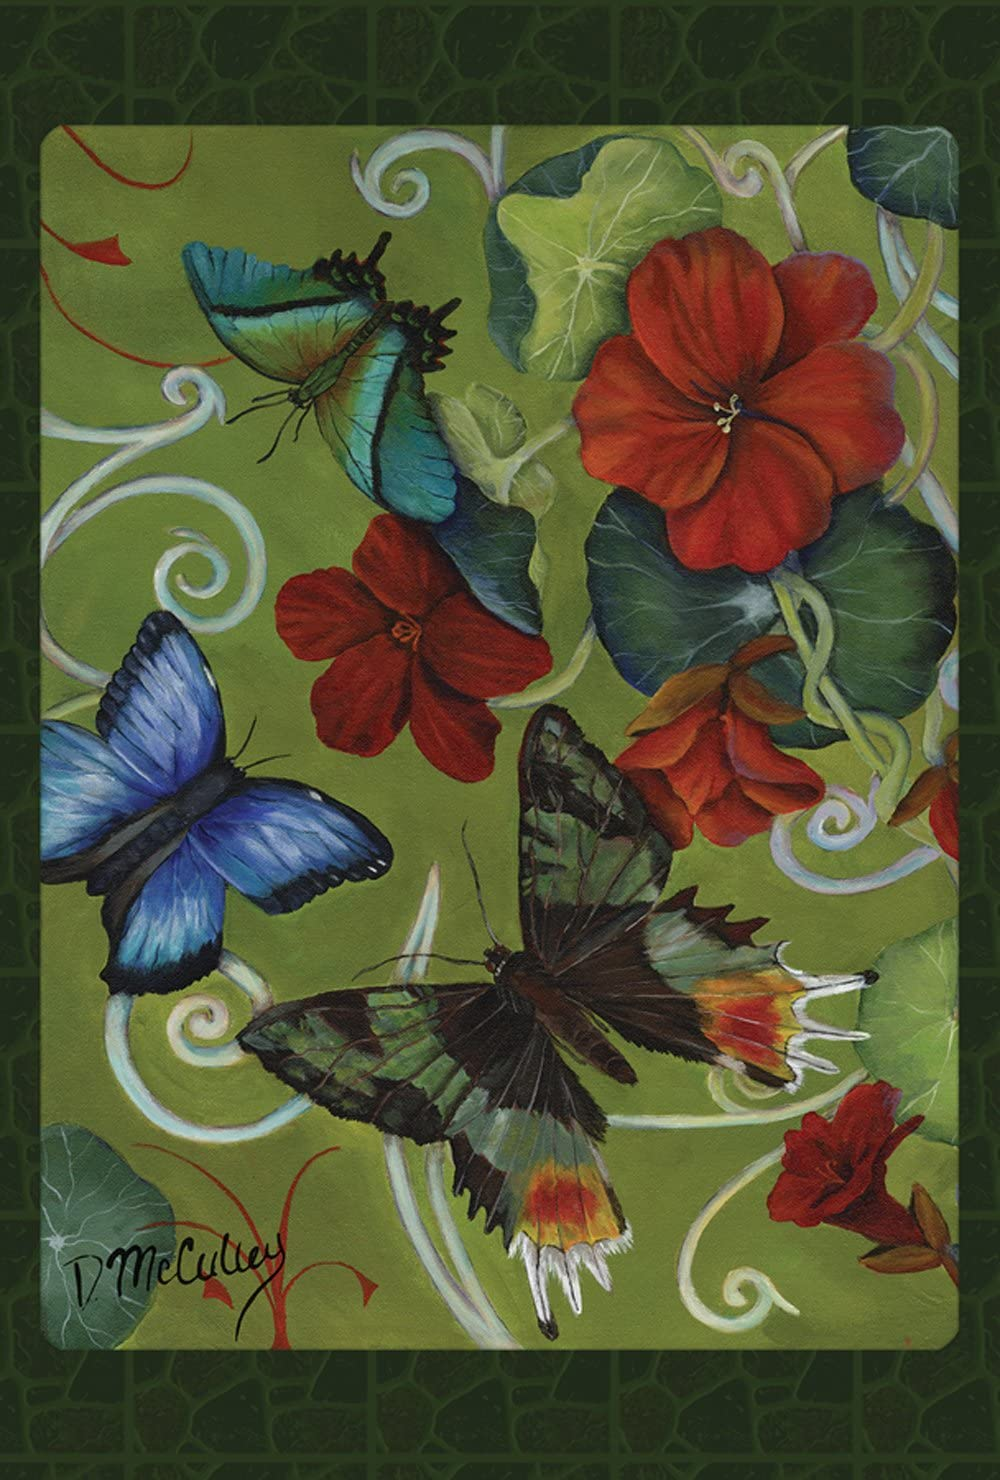 Toland Home Garden Butterflies and Flowers 12.5 x 18 Inch Decorative Spring Summer Floral Butterfly Garden Flag